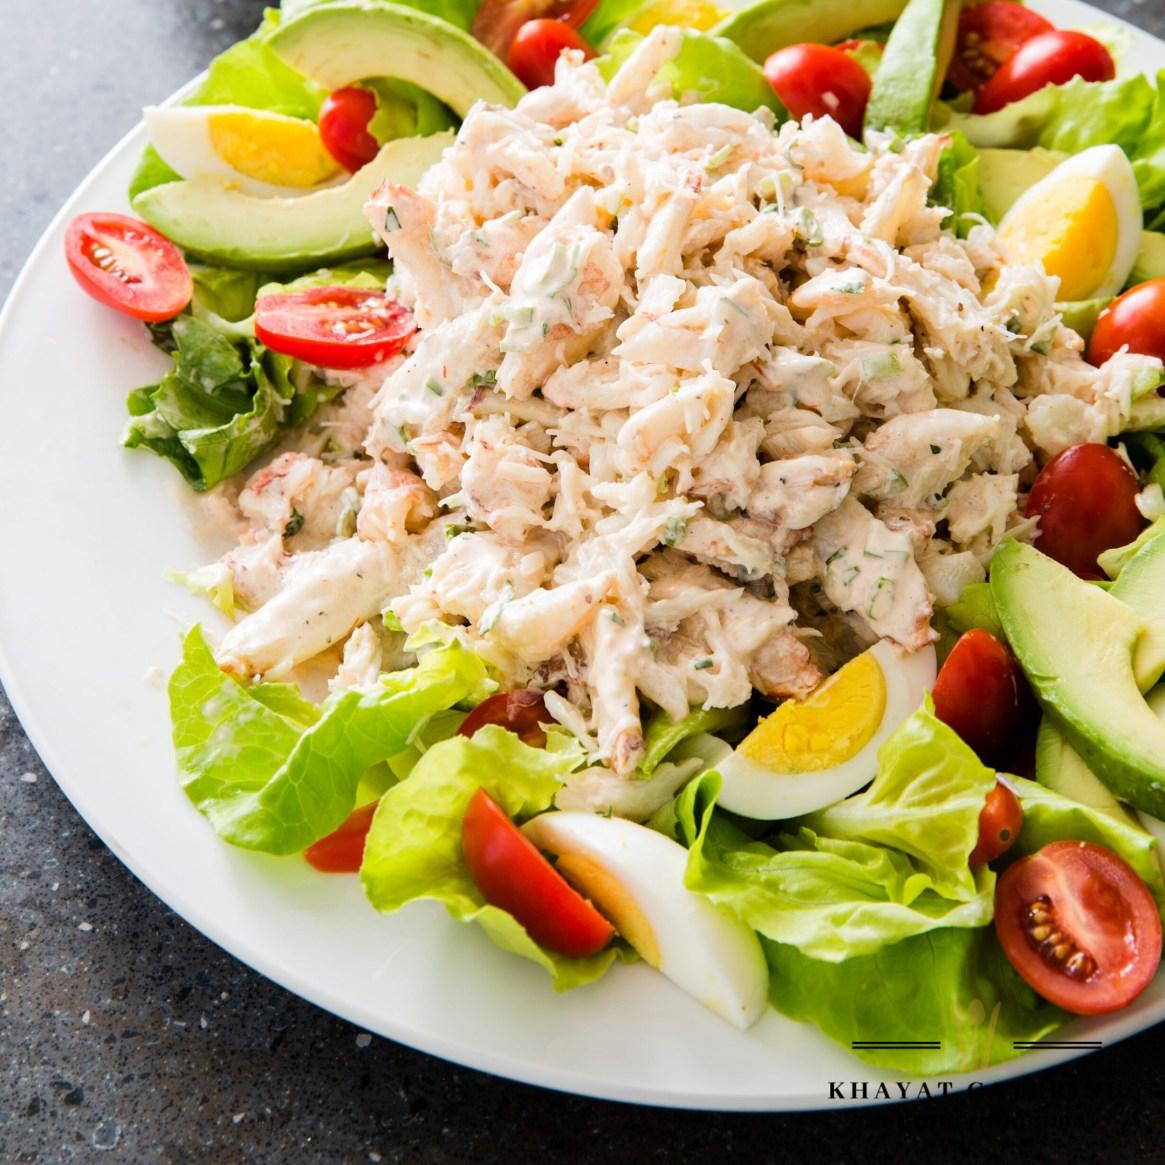 Khayat Catering crab and shrimp Louie salad